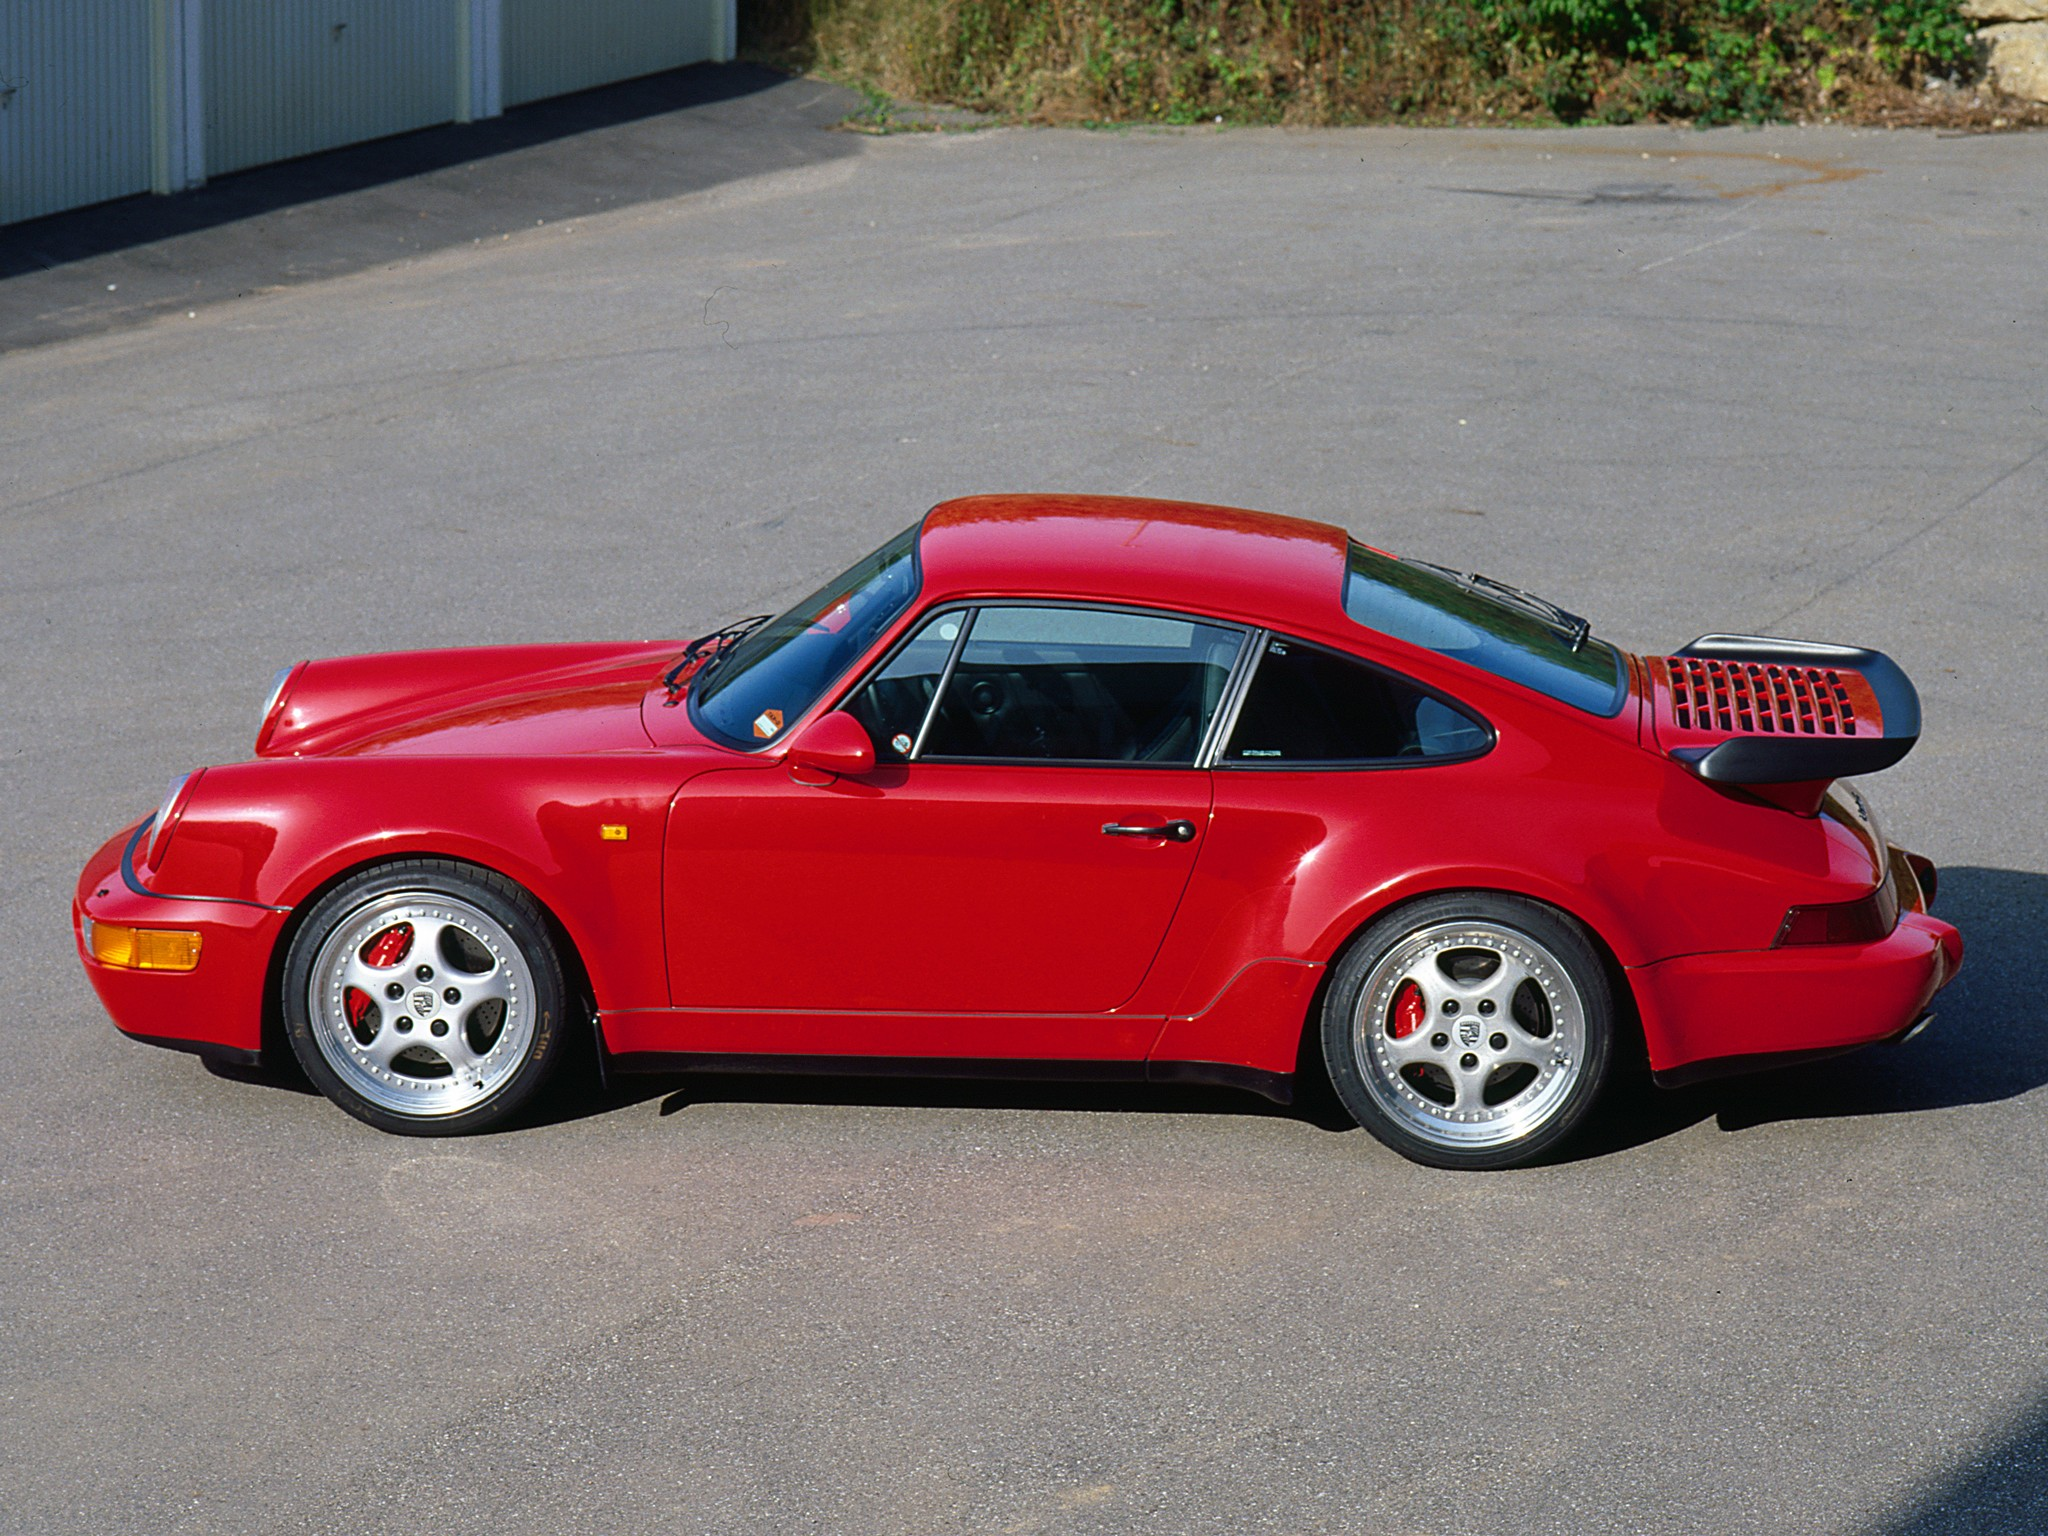 Porsche 911 Turbo 964 1990 1991 1992 1993 1994